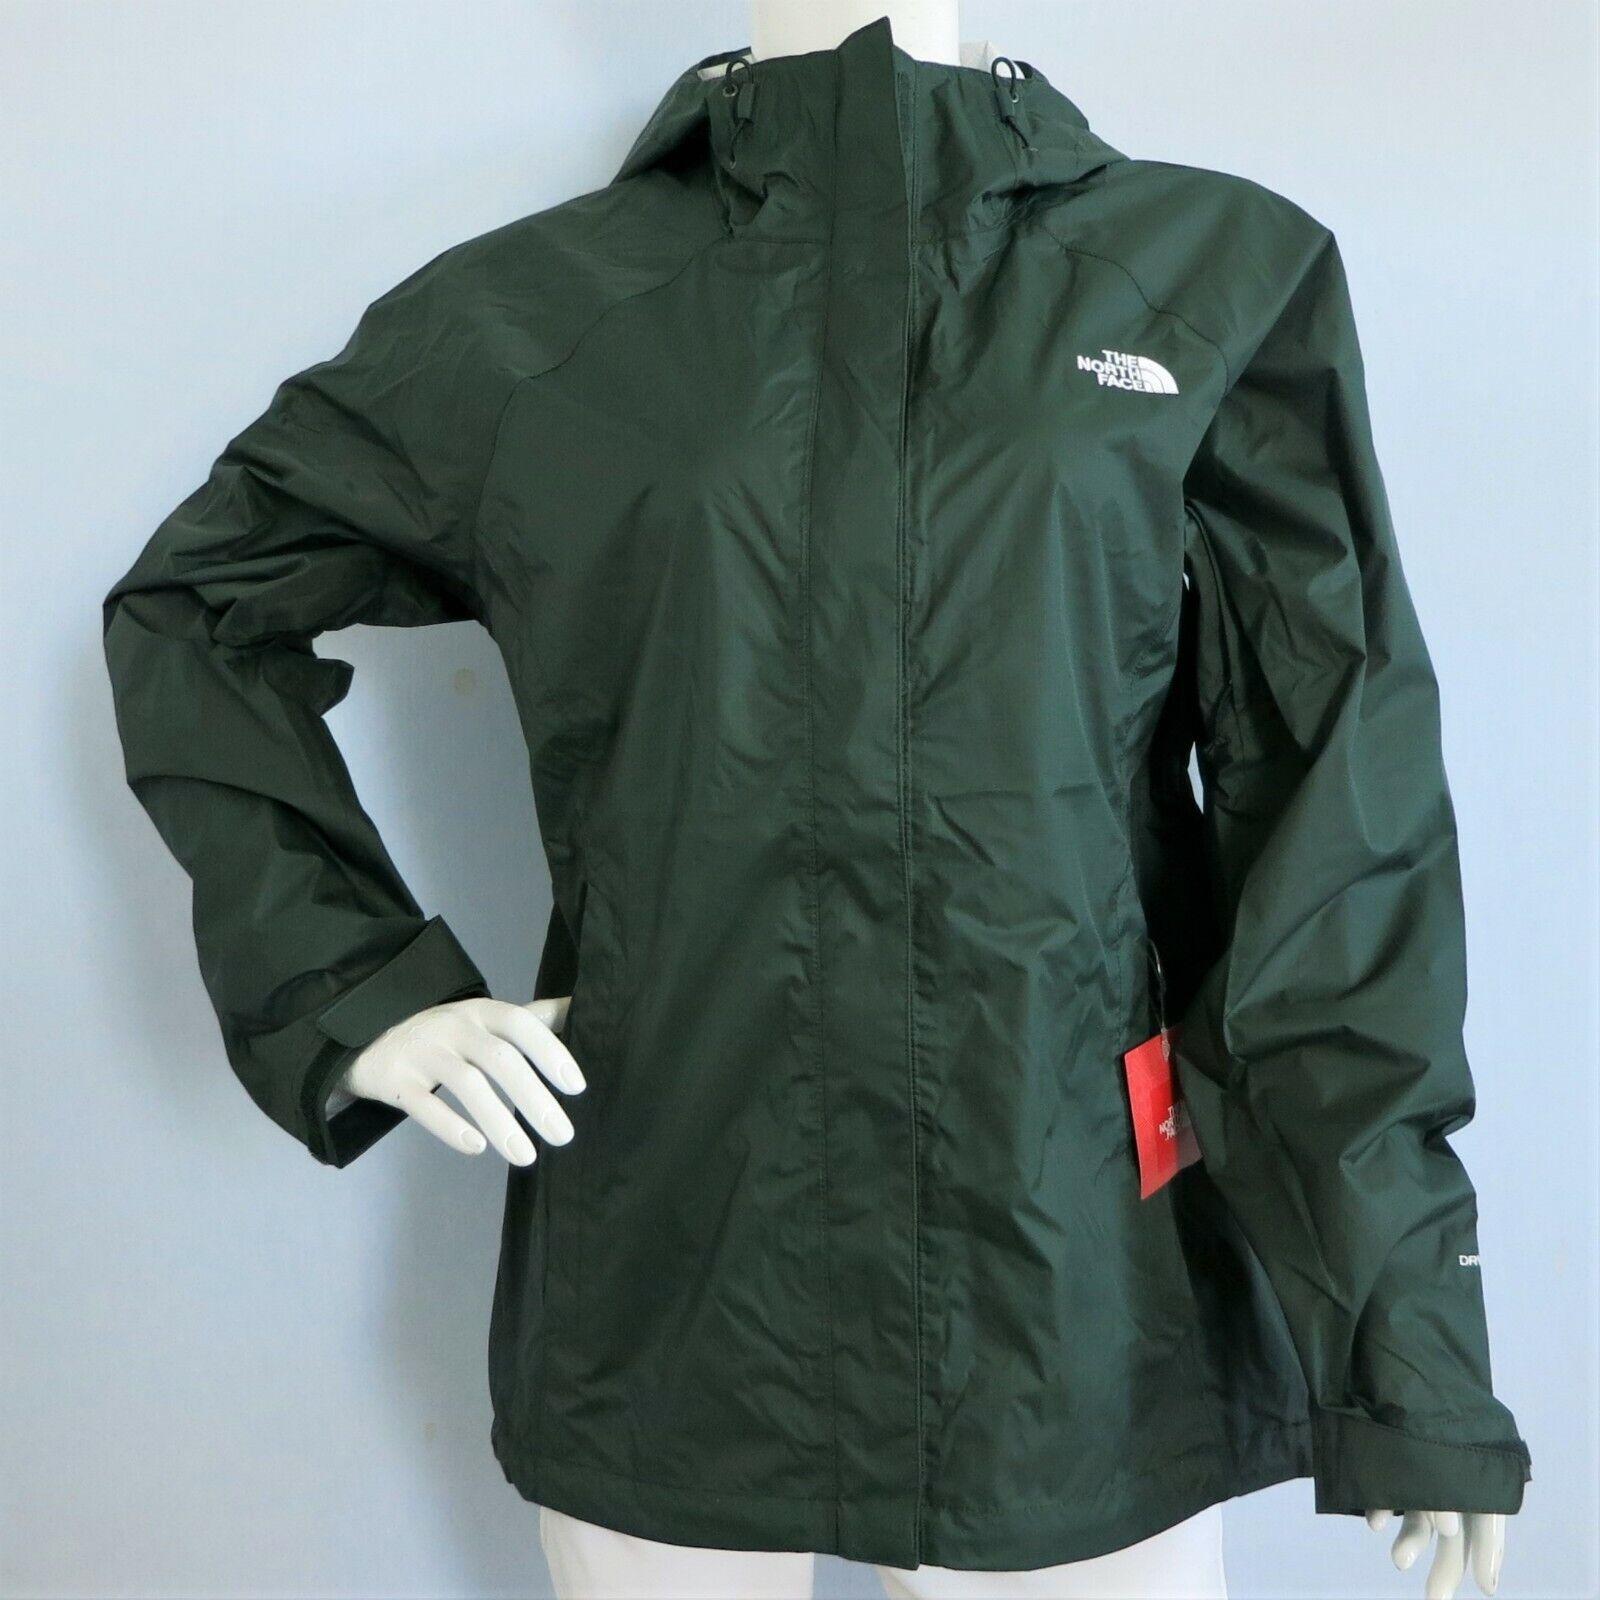 THE NORTH FACE Venture Women's Rain Jacket SCARAB GREEN MSRP